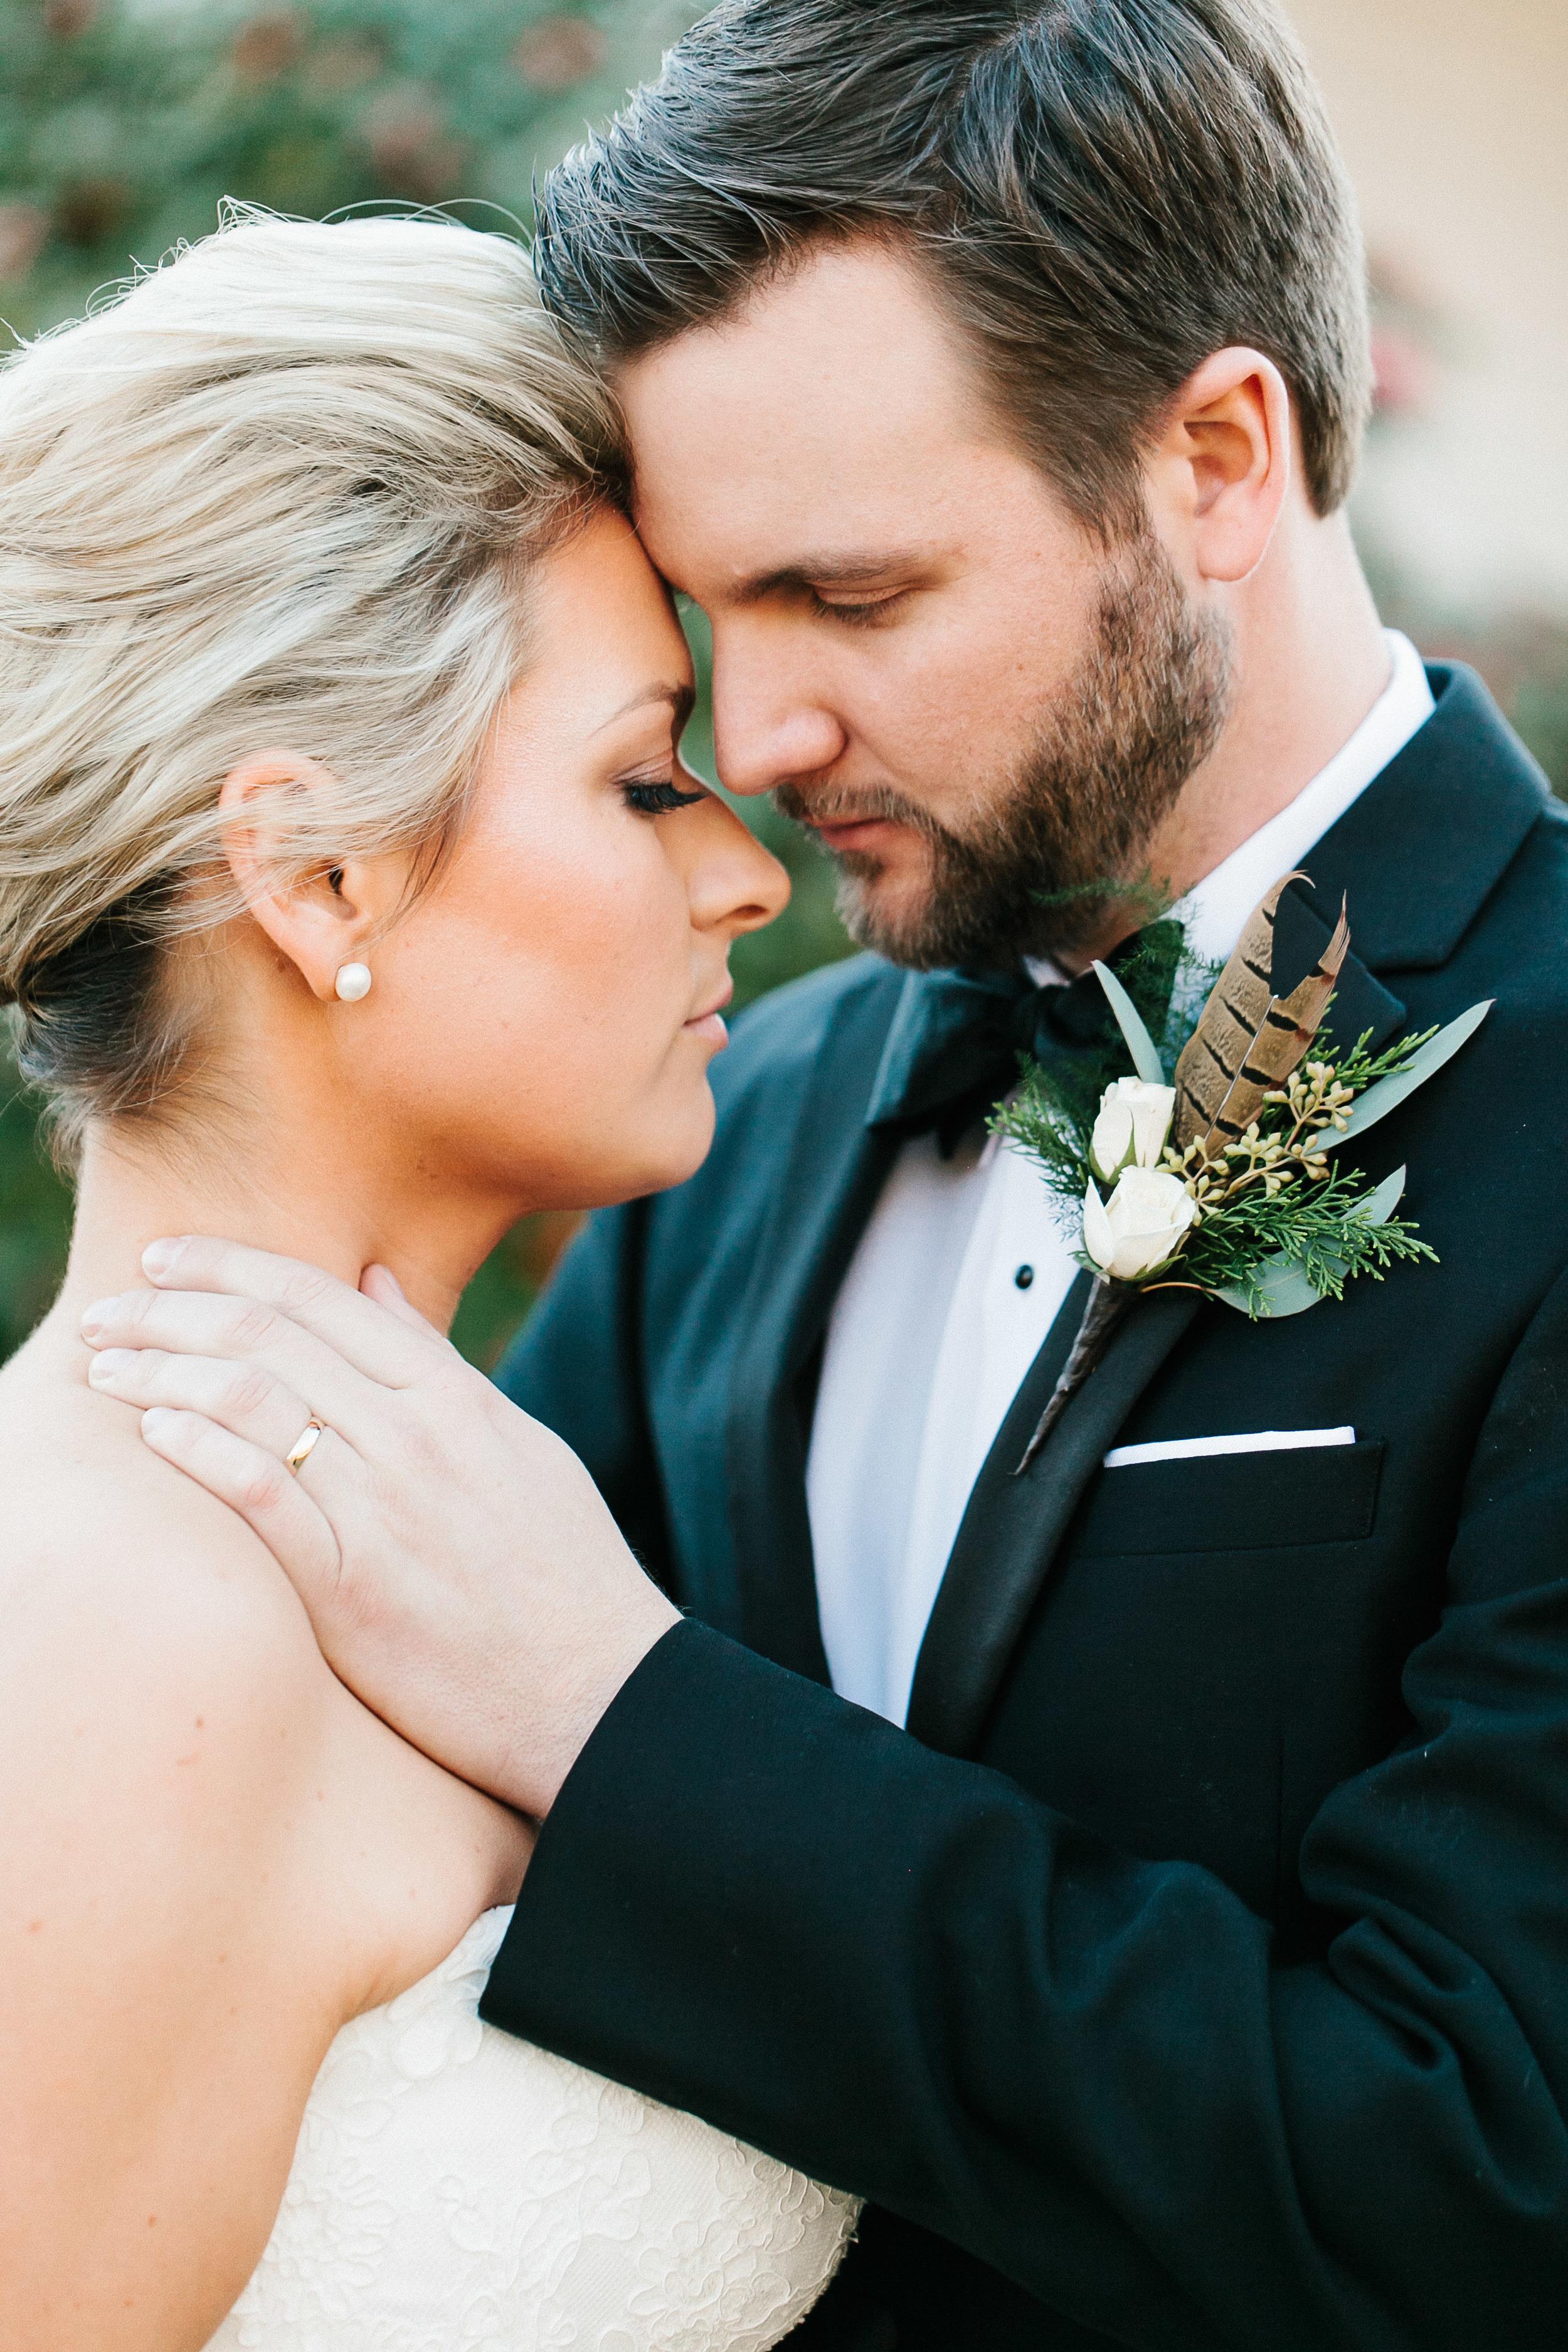 Emily + Sam's Winter Georgia wedding in Stillmore, GA by Mark Williams Studio